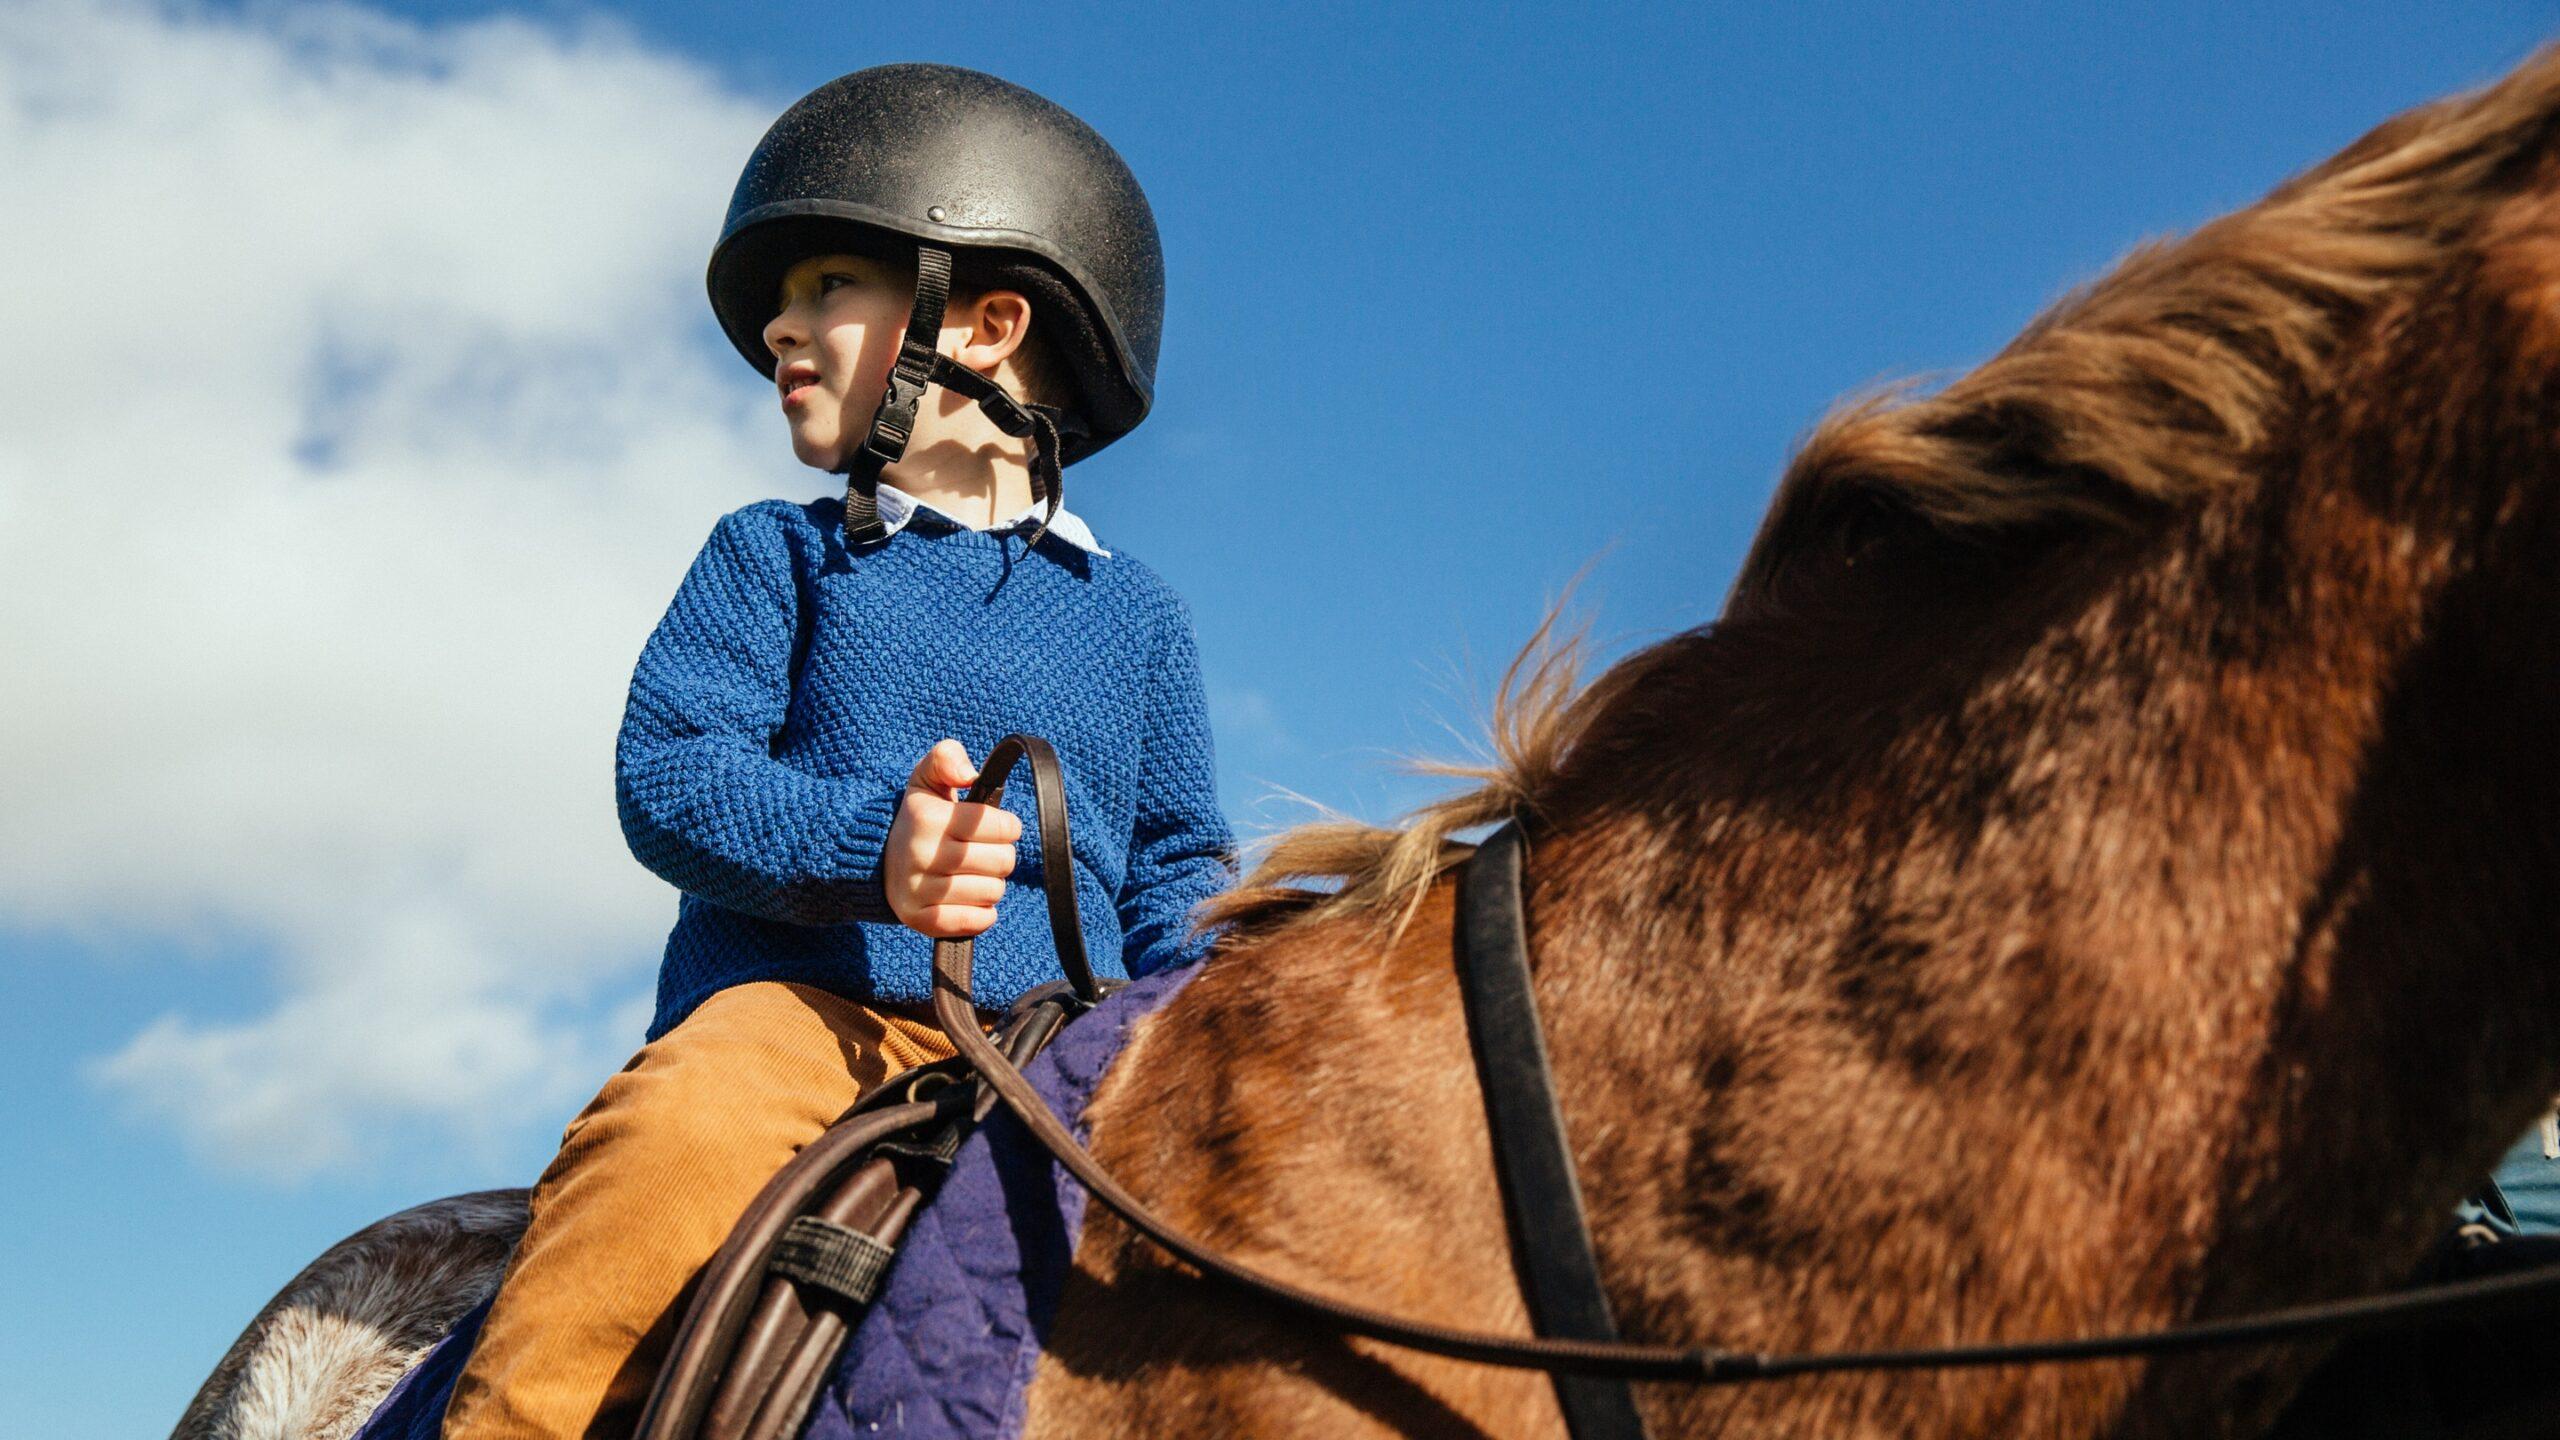 Glen_Equestrian_1